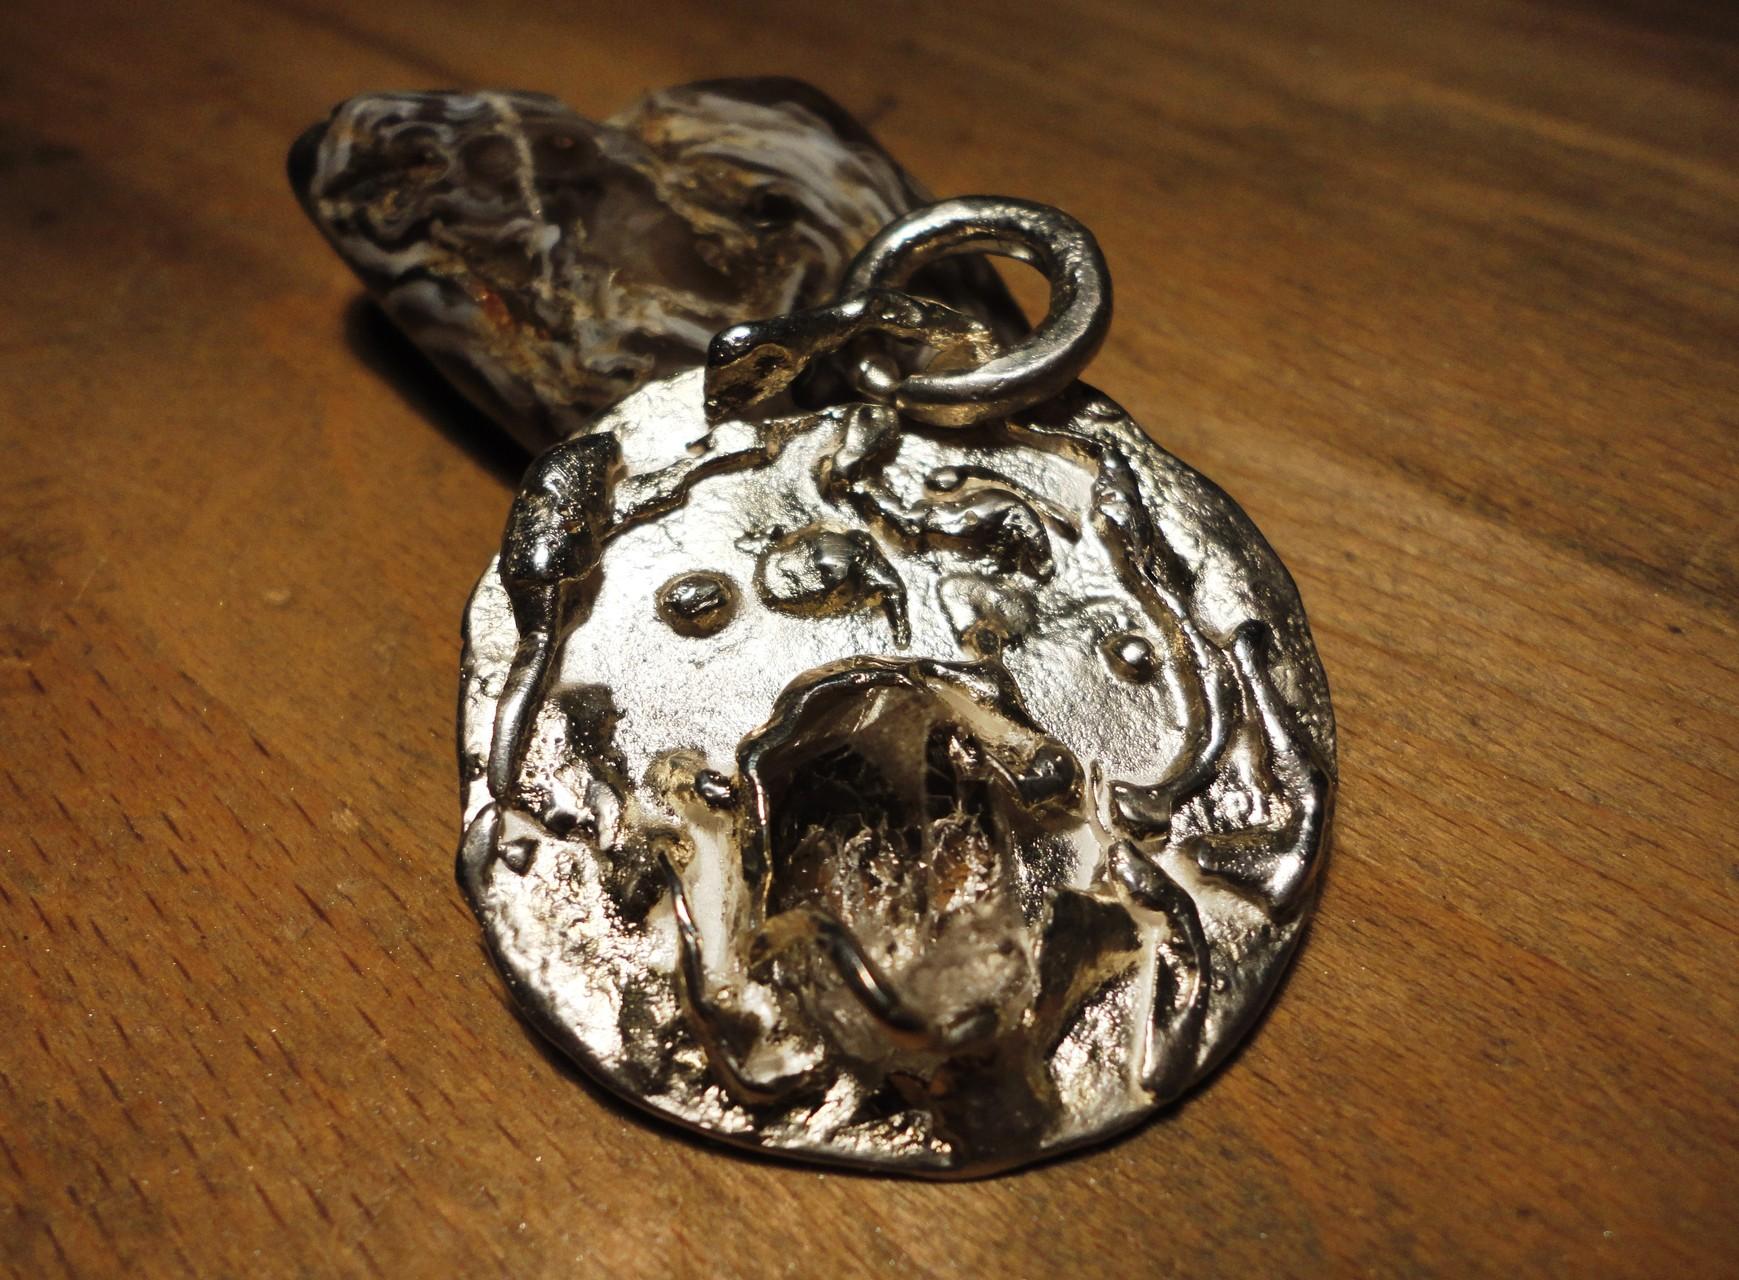 Silber-Anhänger Bergkristall - Durchmesser total: 5 cm (925 Sterlingsilber) Preis: CHF 200.-